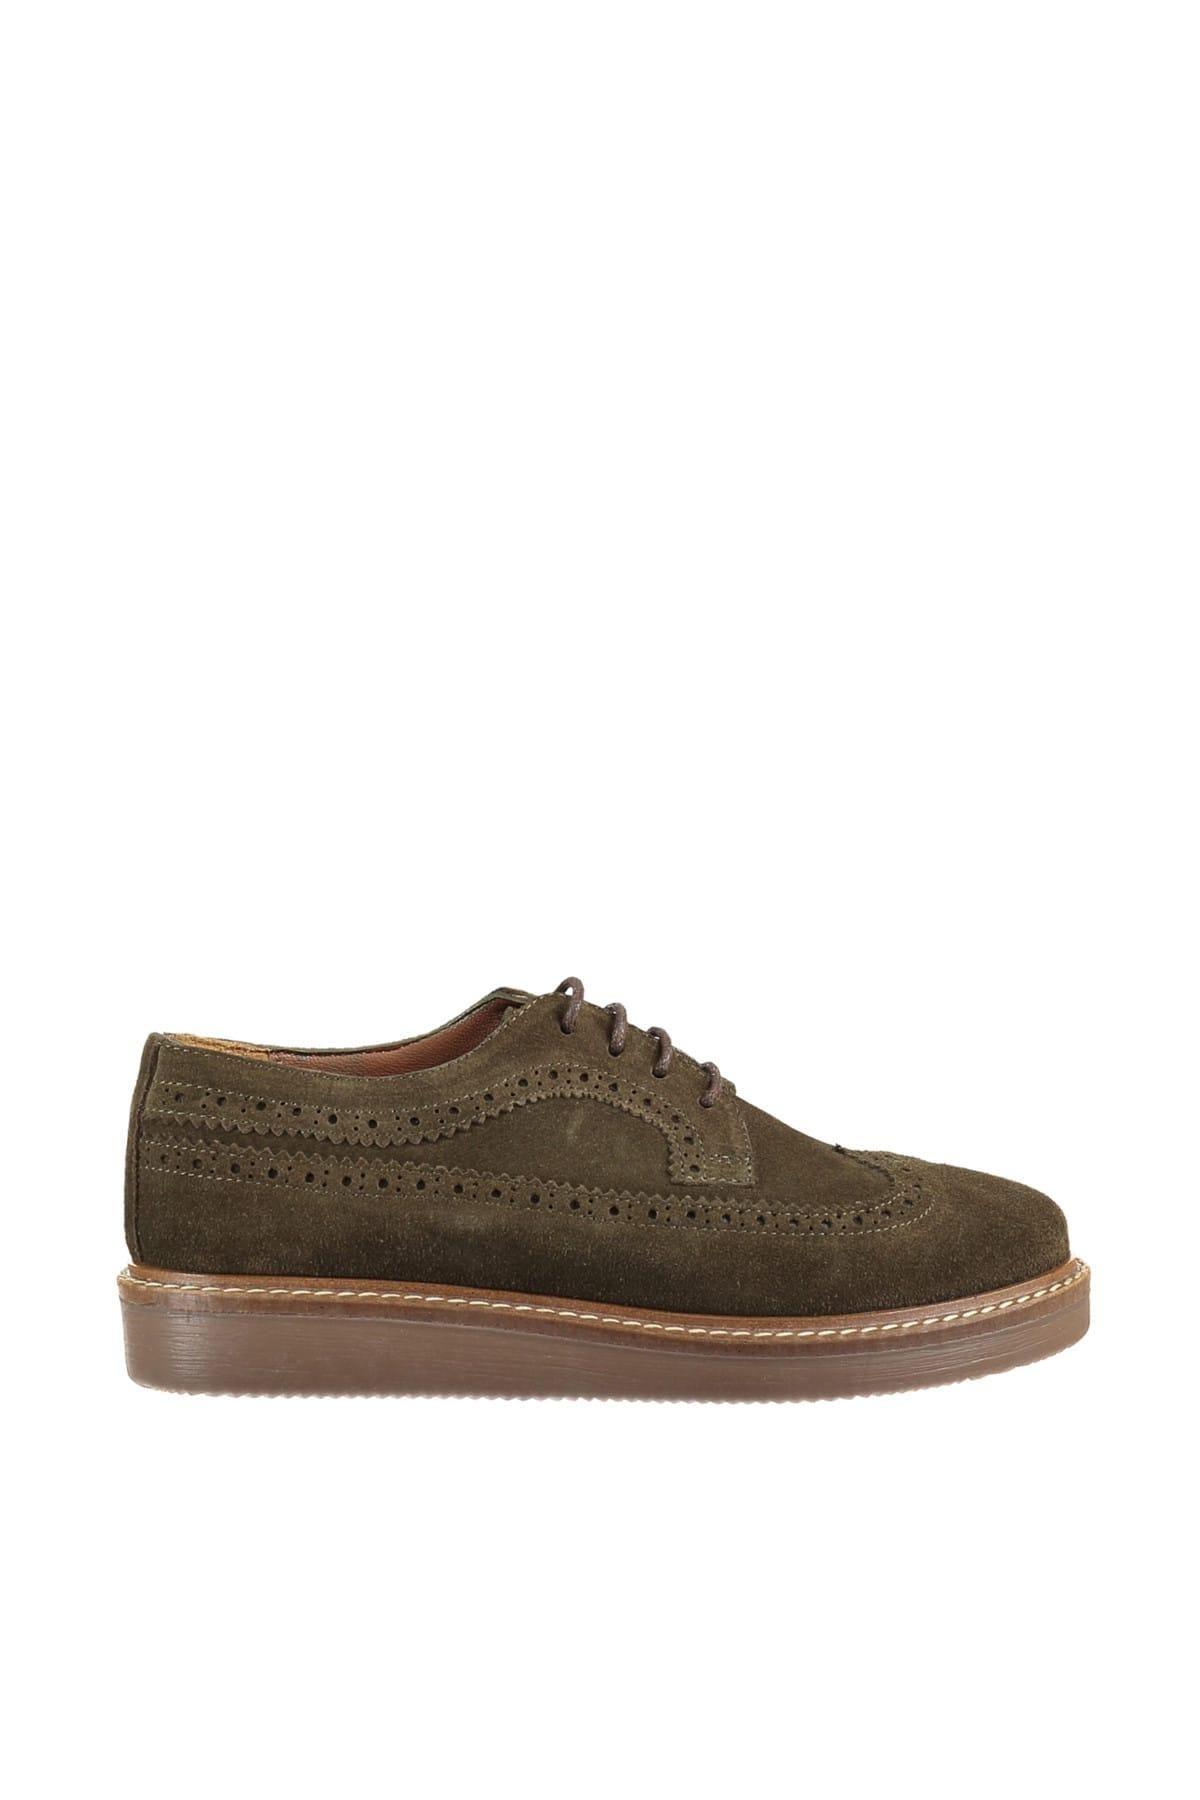 Derimod Khaki das mulheres Sapatos